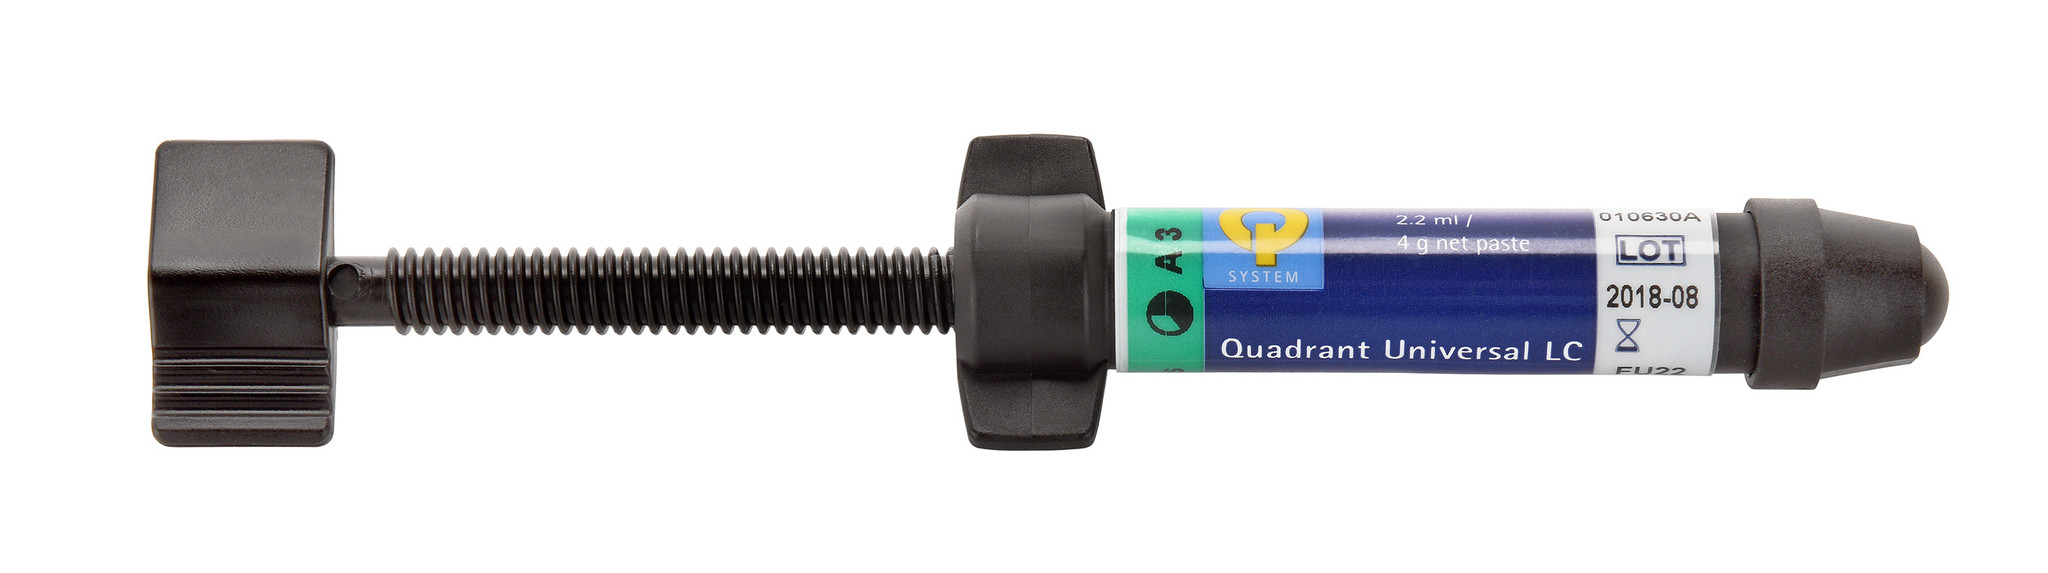 Cavex Quadrant Universal LC spuit (4 gr, verschillende varianten)